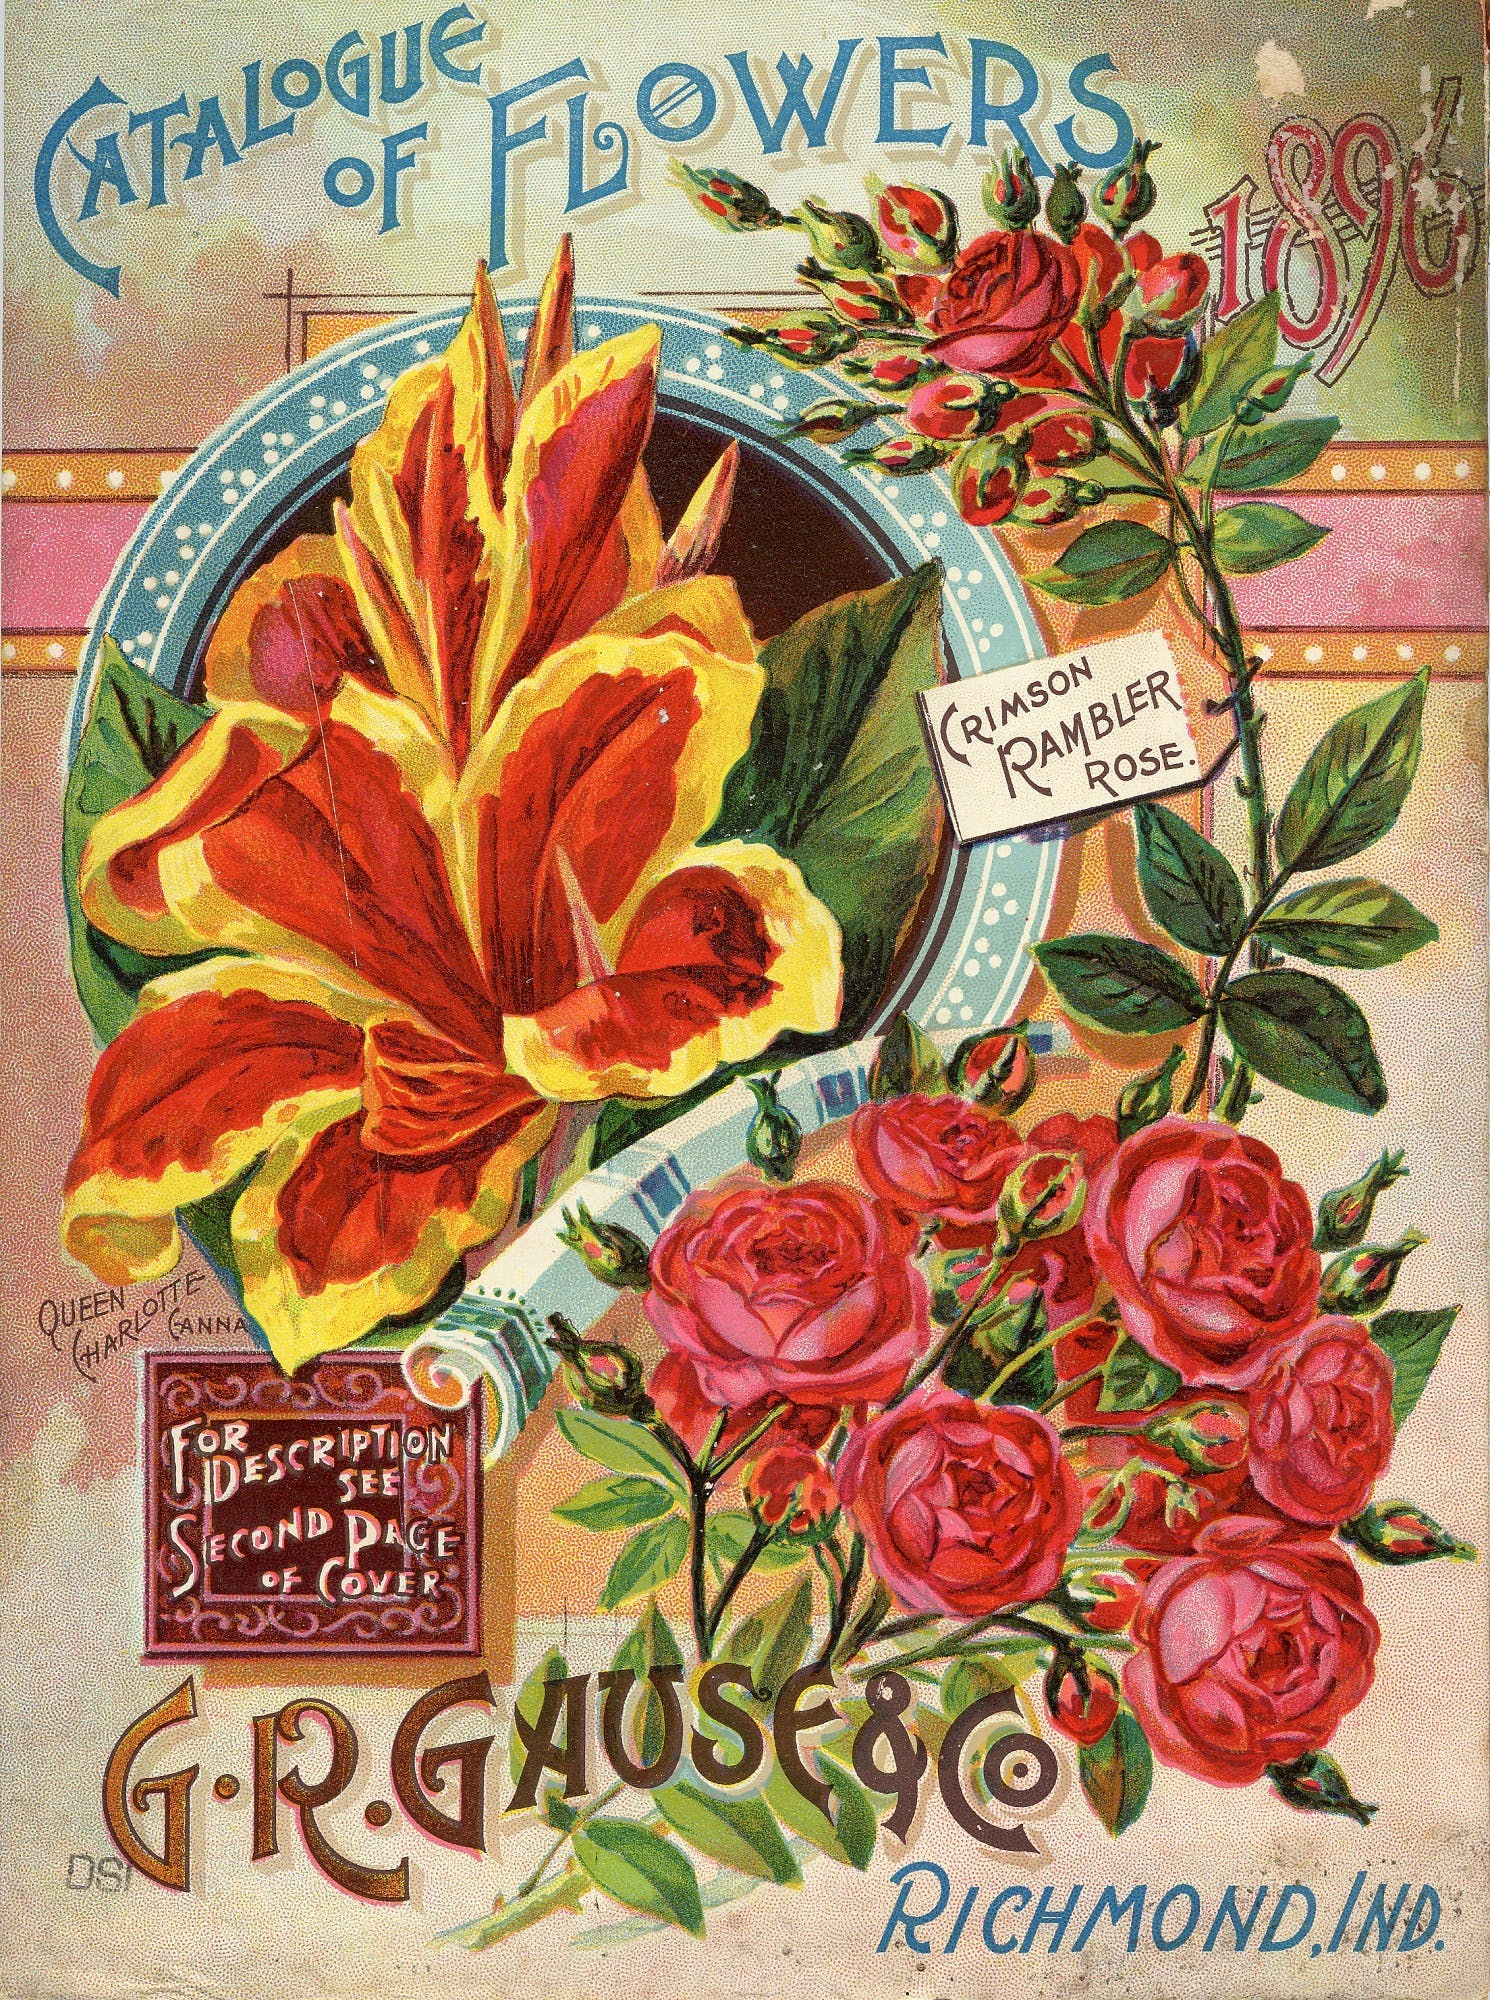 seed catalog image of flowers